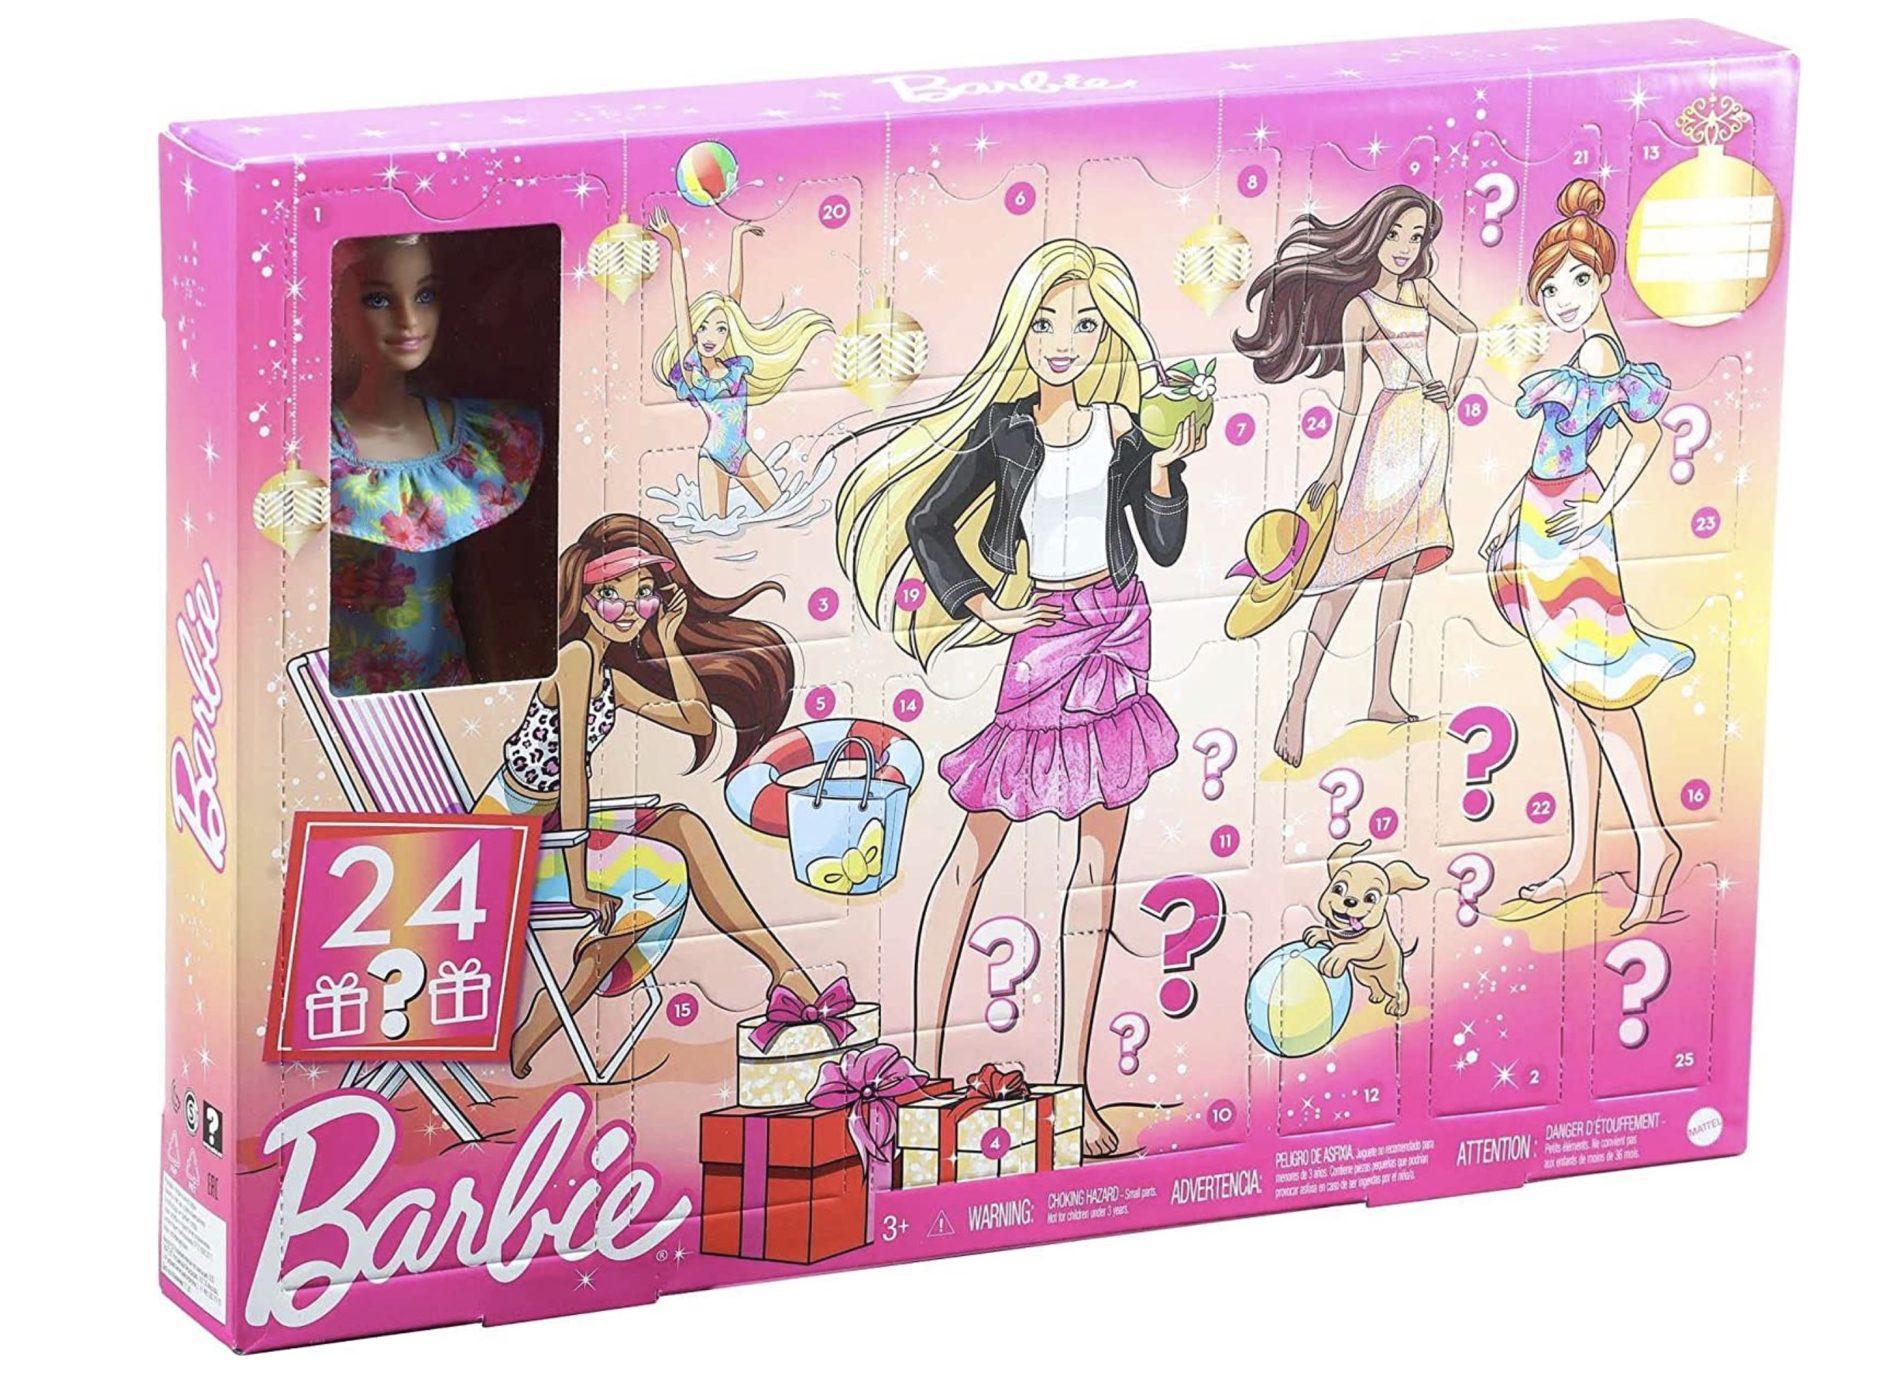 Barbie Advent Calendar with Barbie Doll